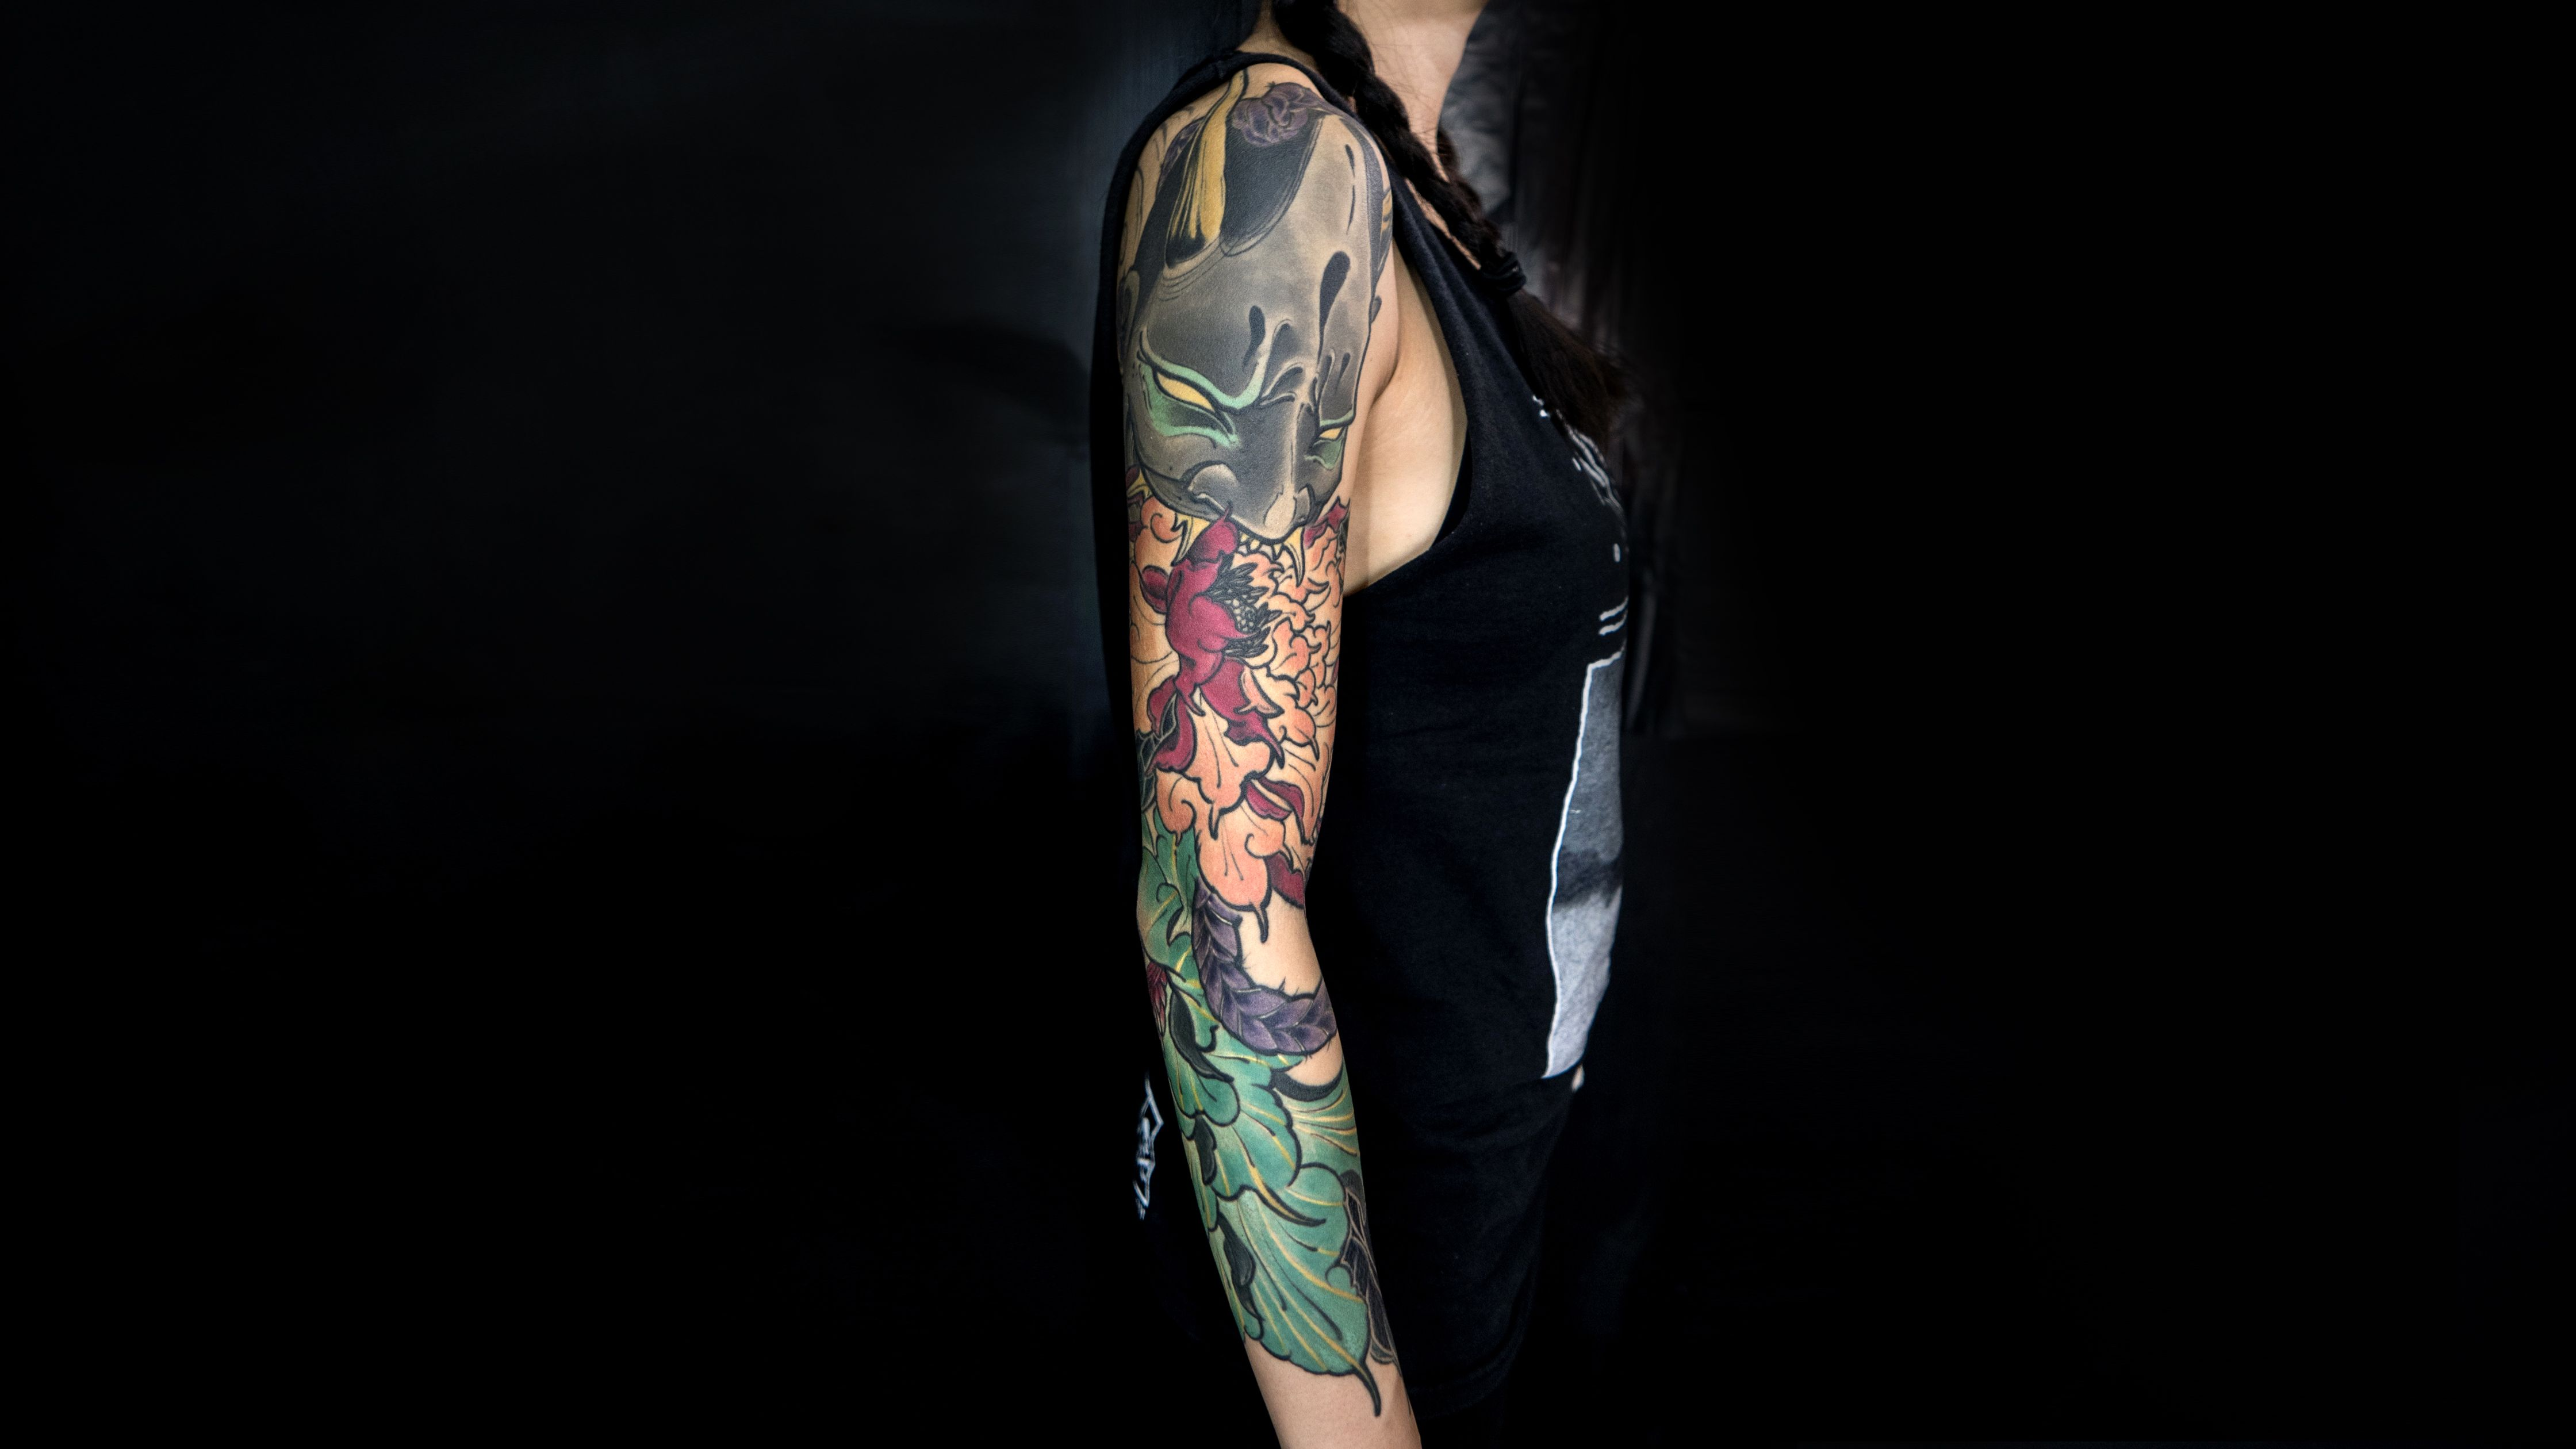 tattoo tattoos ink inked inkedup japanese